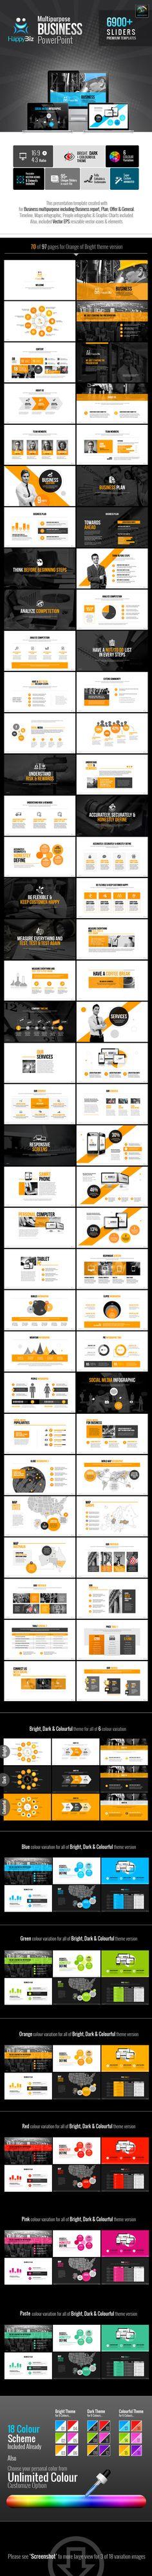 HappyBiz Multipurpose Business TemplatePowerPoint Template / Theme / Presentation / Slides / Background / Power Point #powerpoint #template #theme